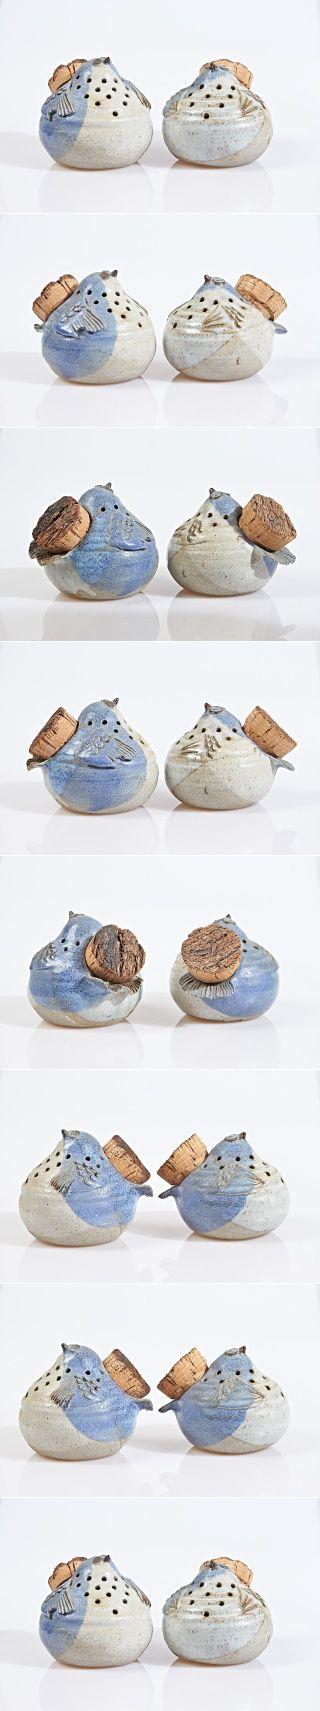 pomander birds